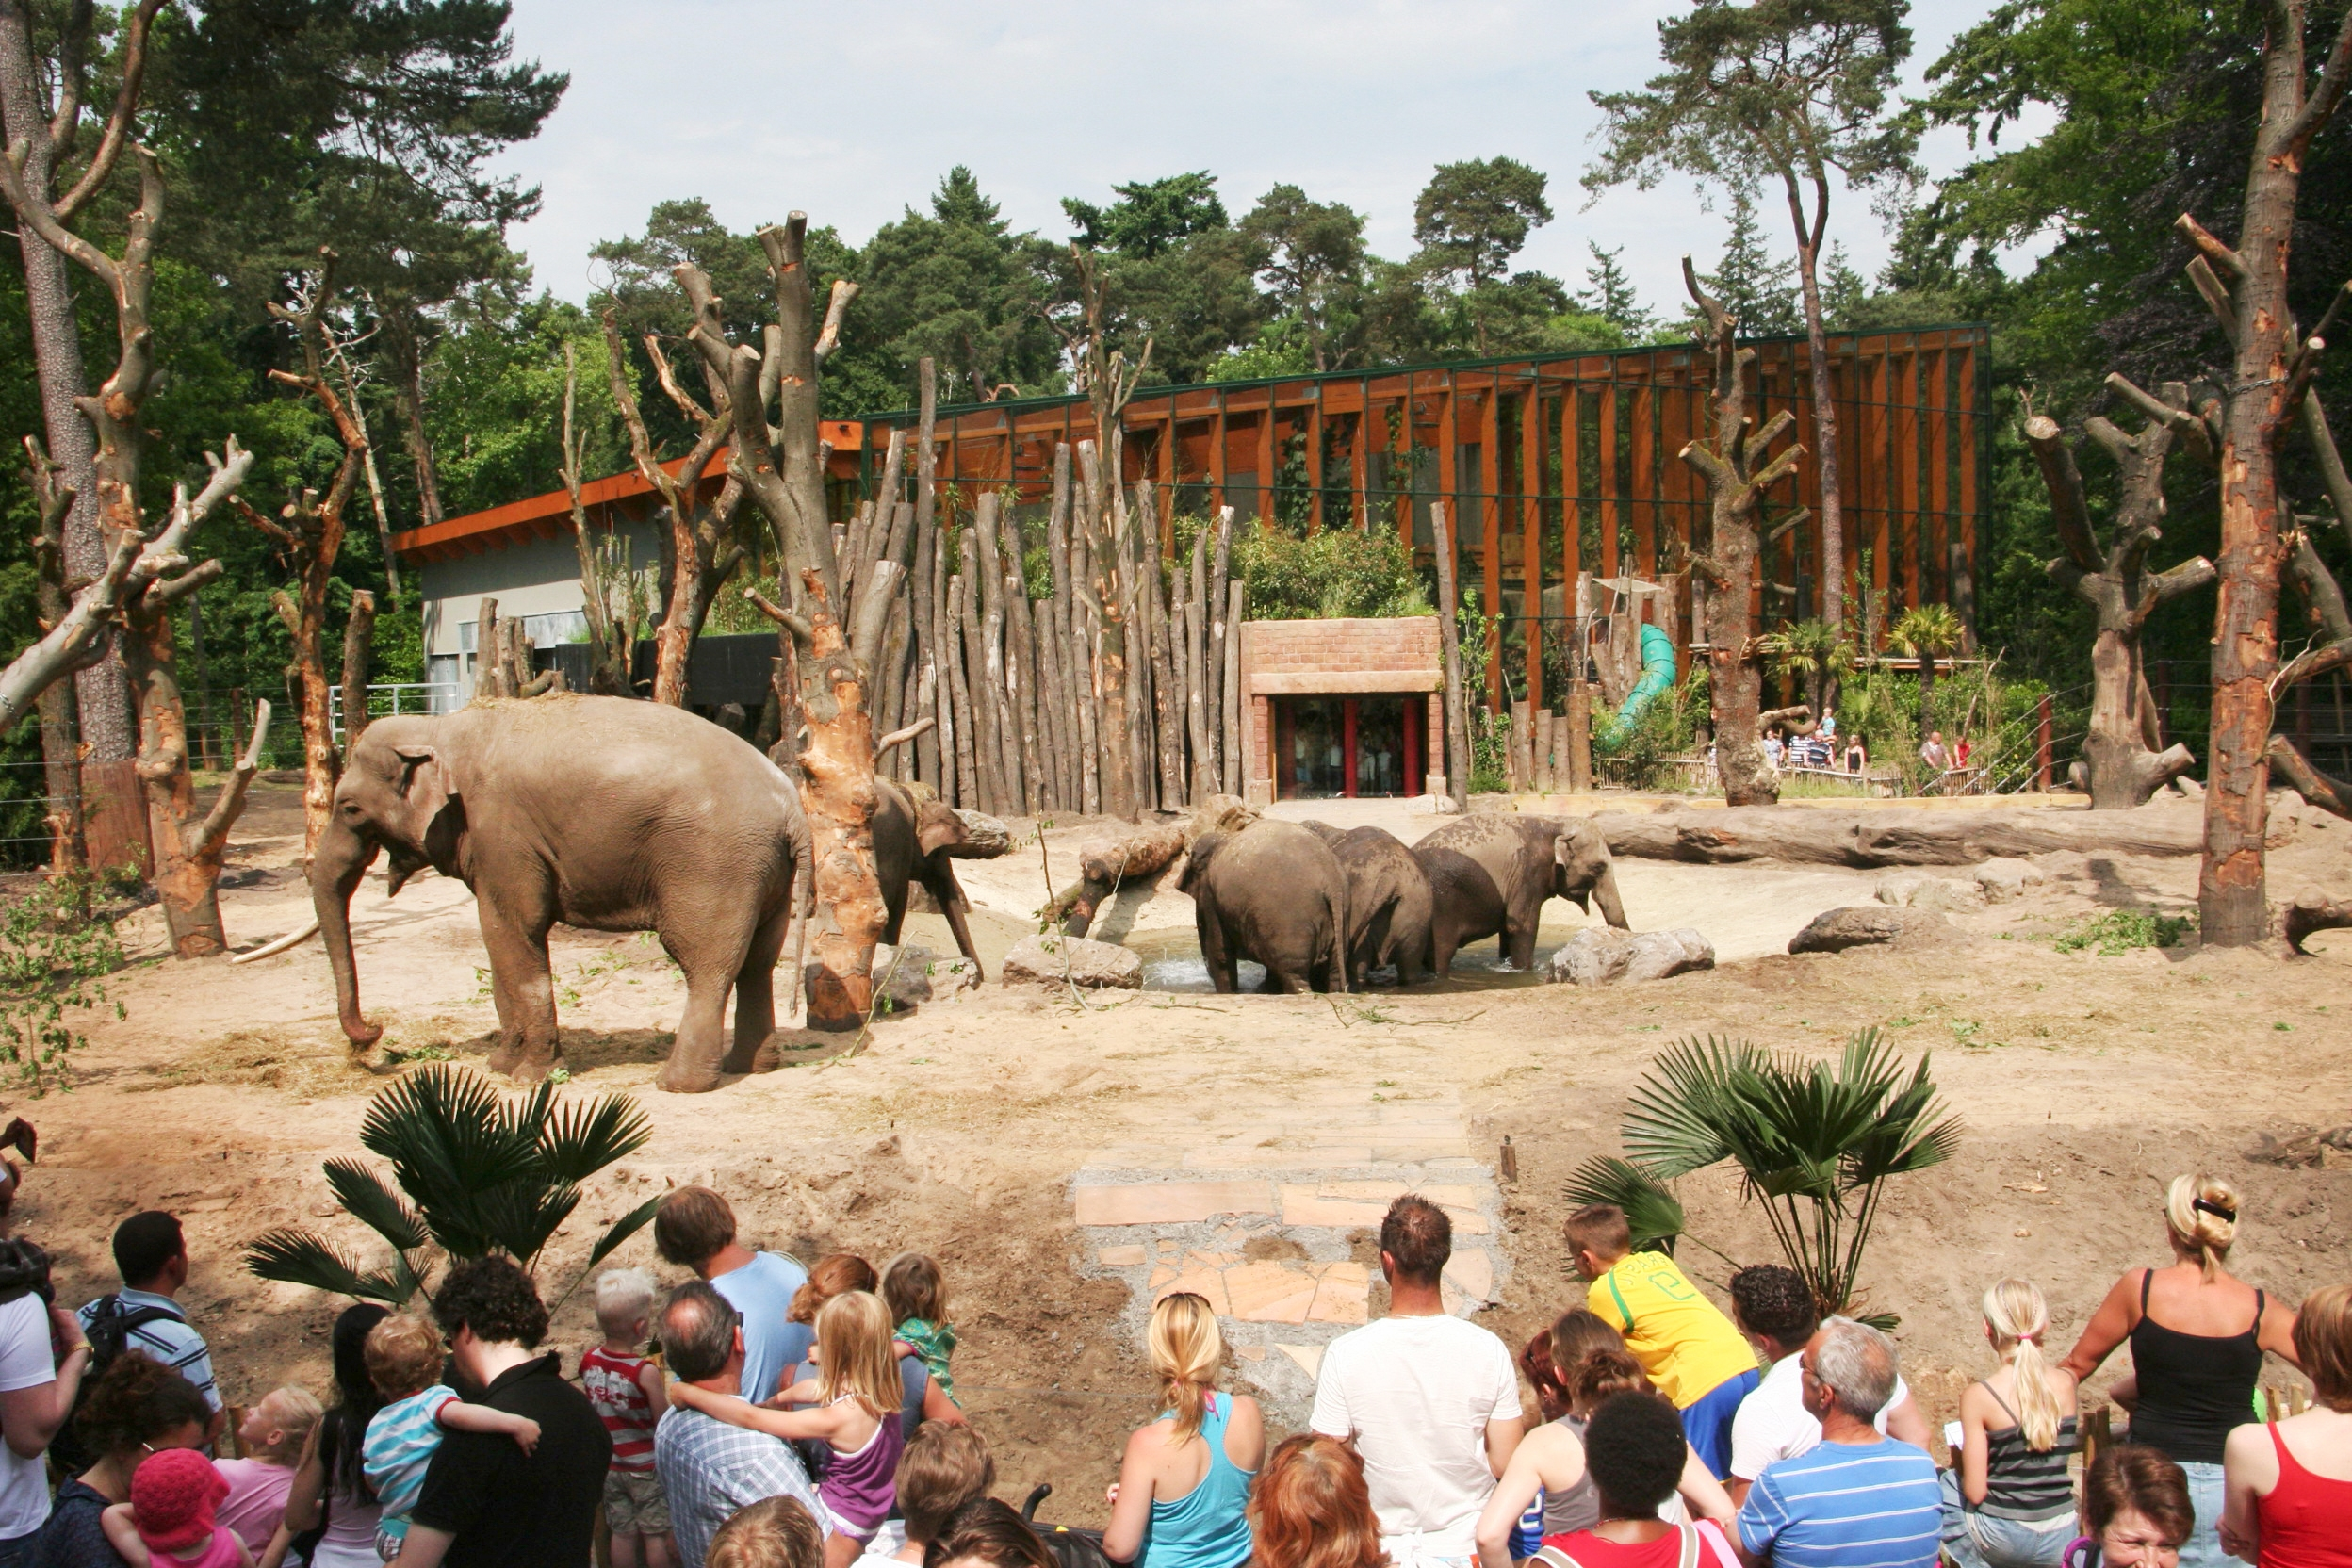 ZOOSITE BENELUX 2012<strong>ZOOSITE Benelux for project Amersfoort Zoo, the Netherlands</strong>